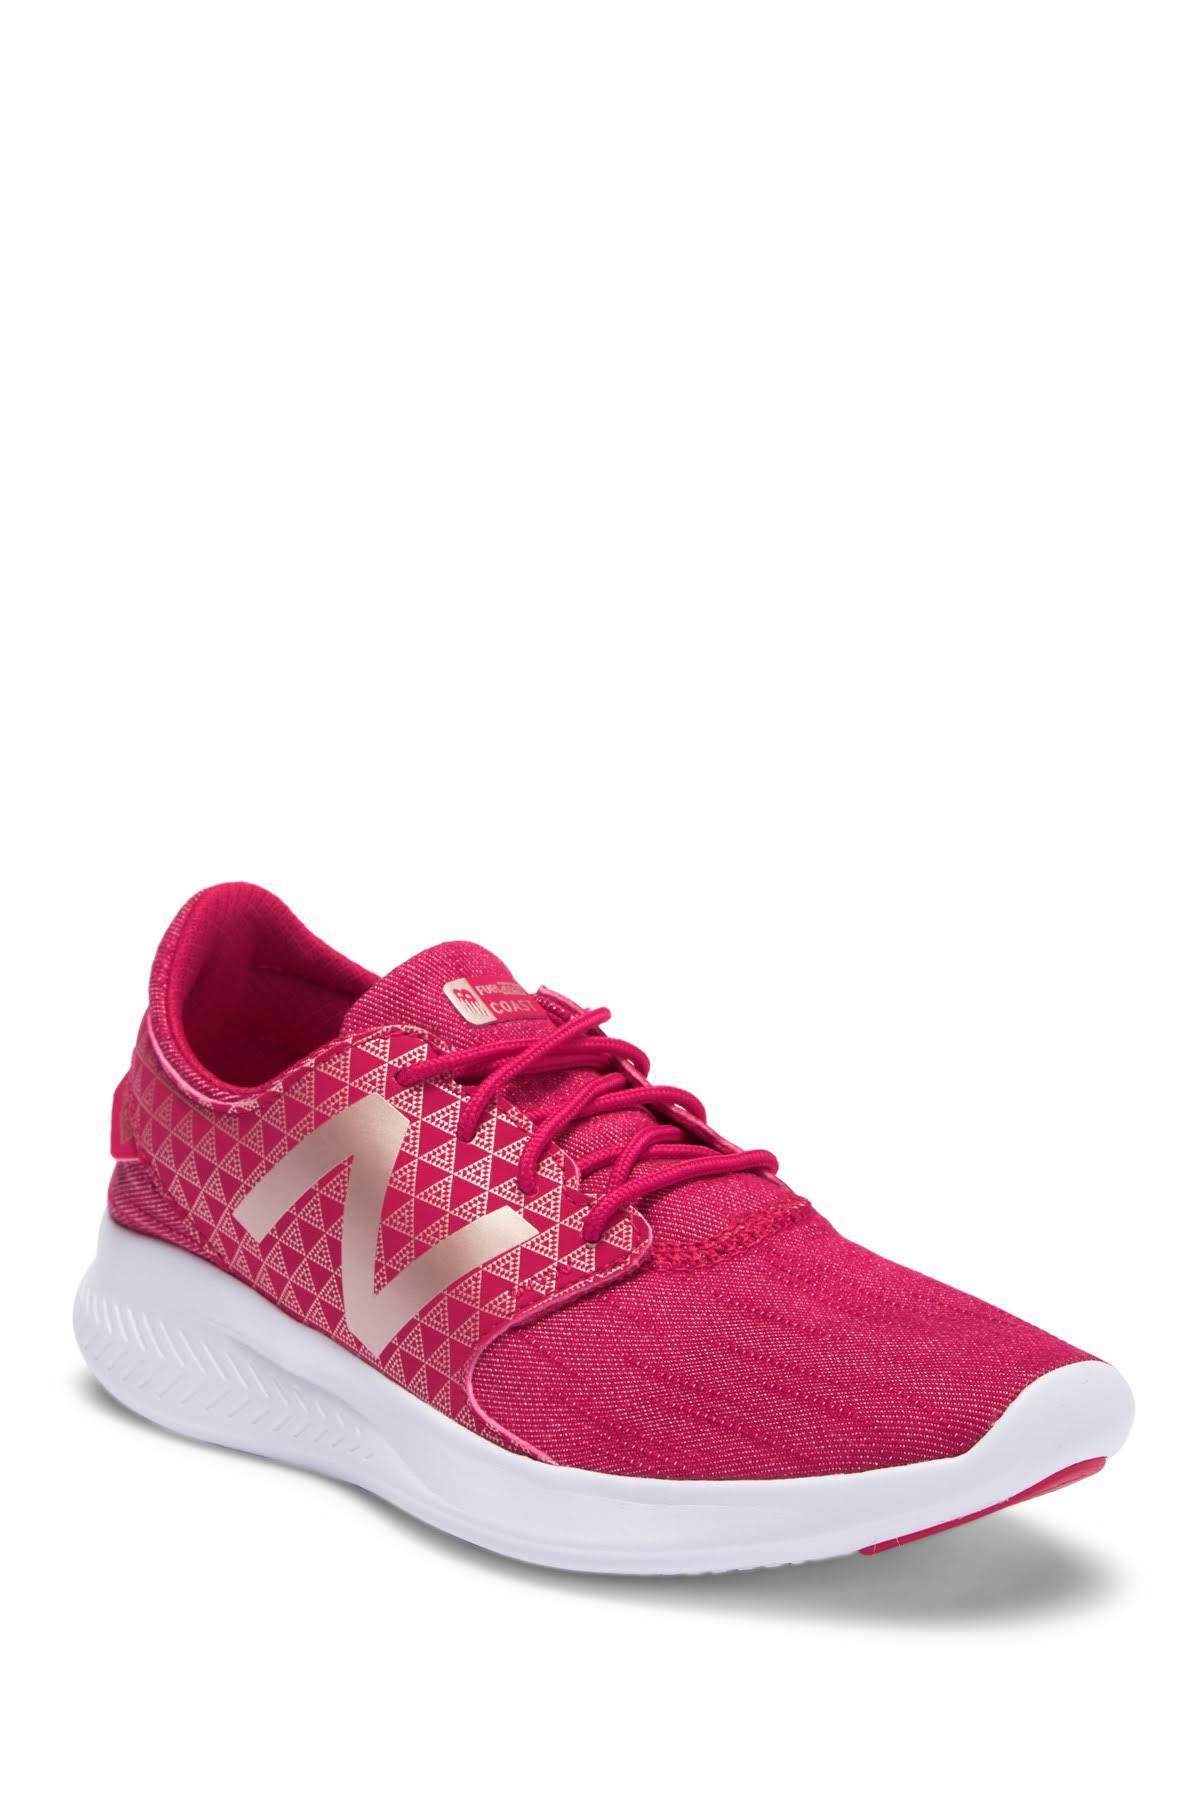 Escolar Metallic Calzado Balance Pink Magnetic Cstv3 New Shoes wAzxqAvd